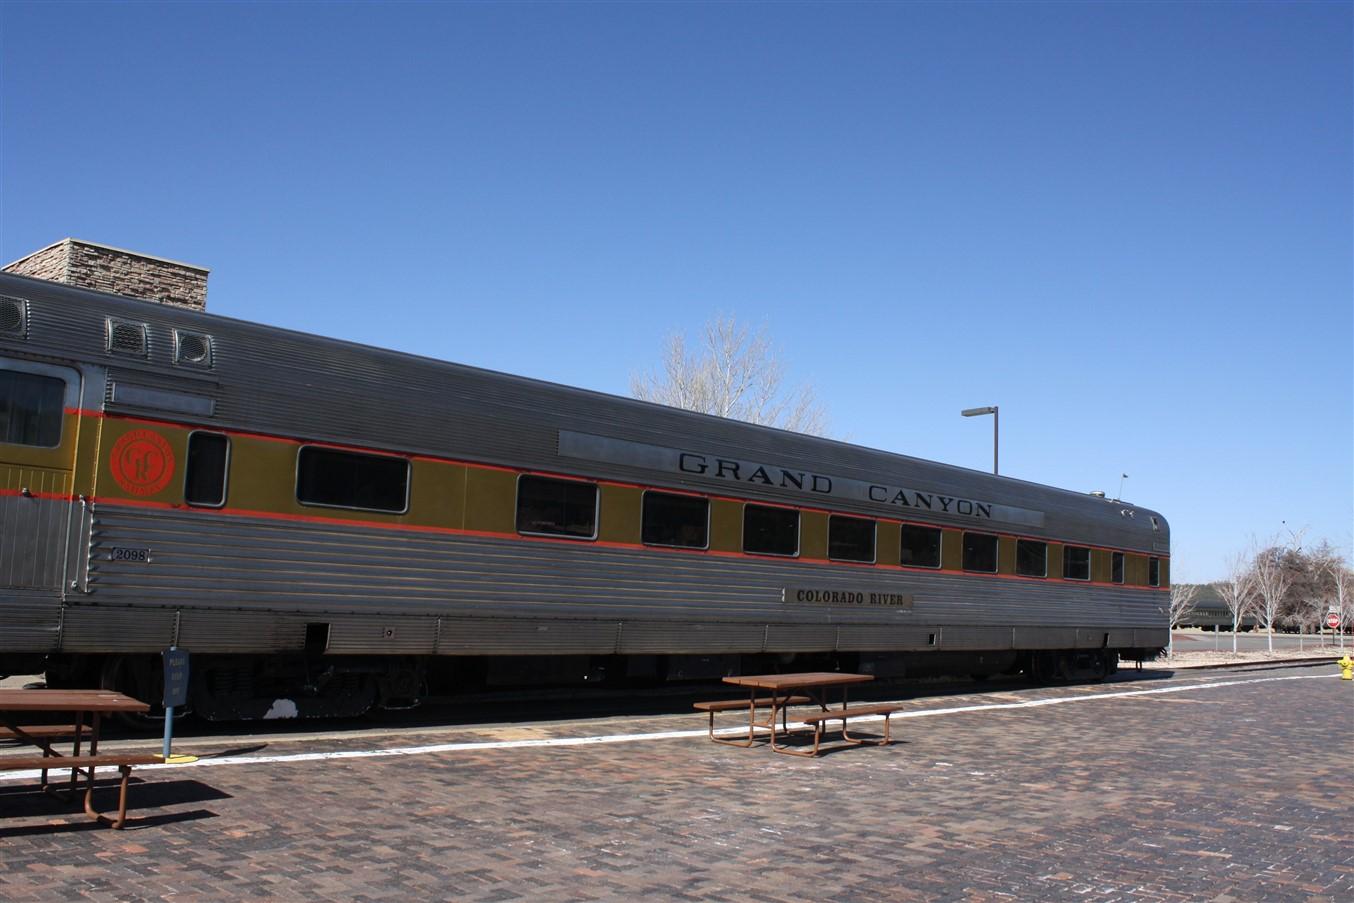 2012 03 14 Route 66 Road Trip 221 Williams Arizona.jpg